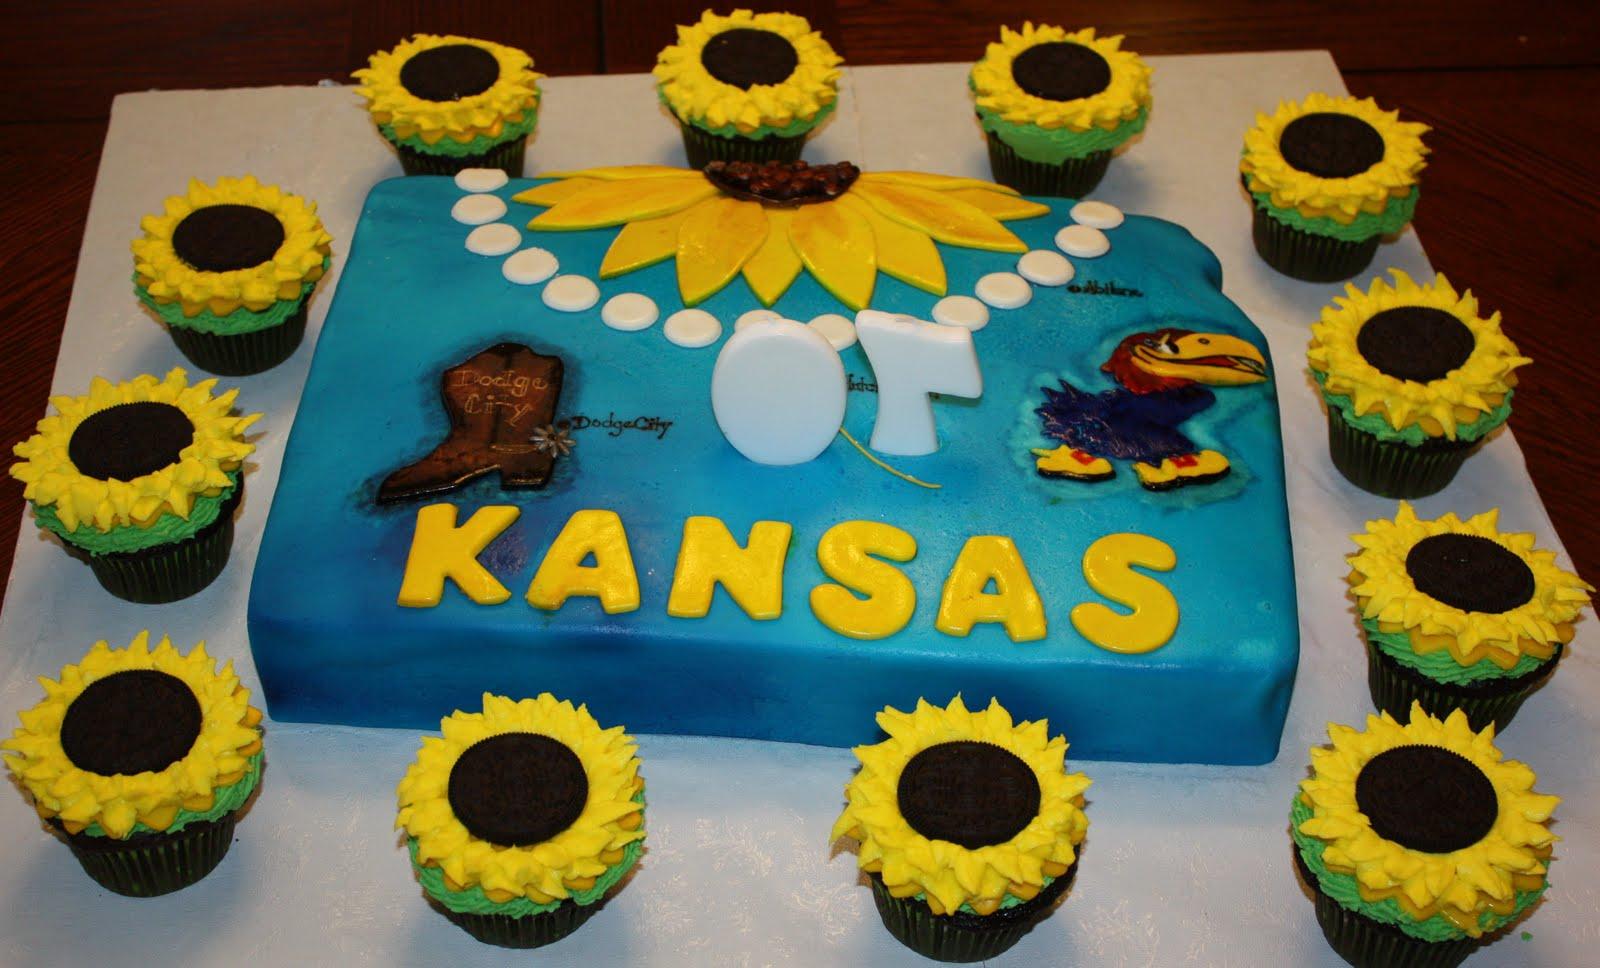 http://1.bp.blogspot.com/-9tHLSM8iB9Y/Thkk8VIVIkI/AAAAAAAAANE/S4agUeCaXmE/s1600/Kansas%20and%20sunflower%20cupcake.JPG